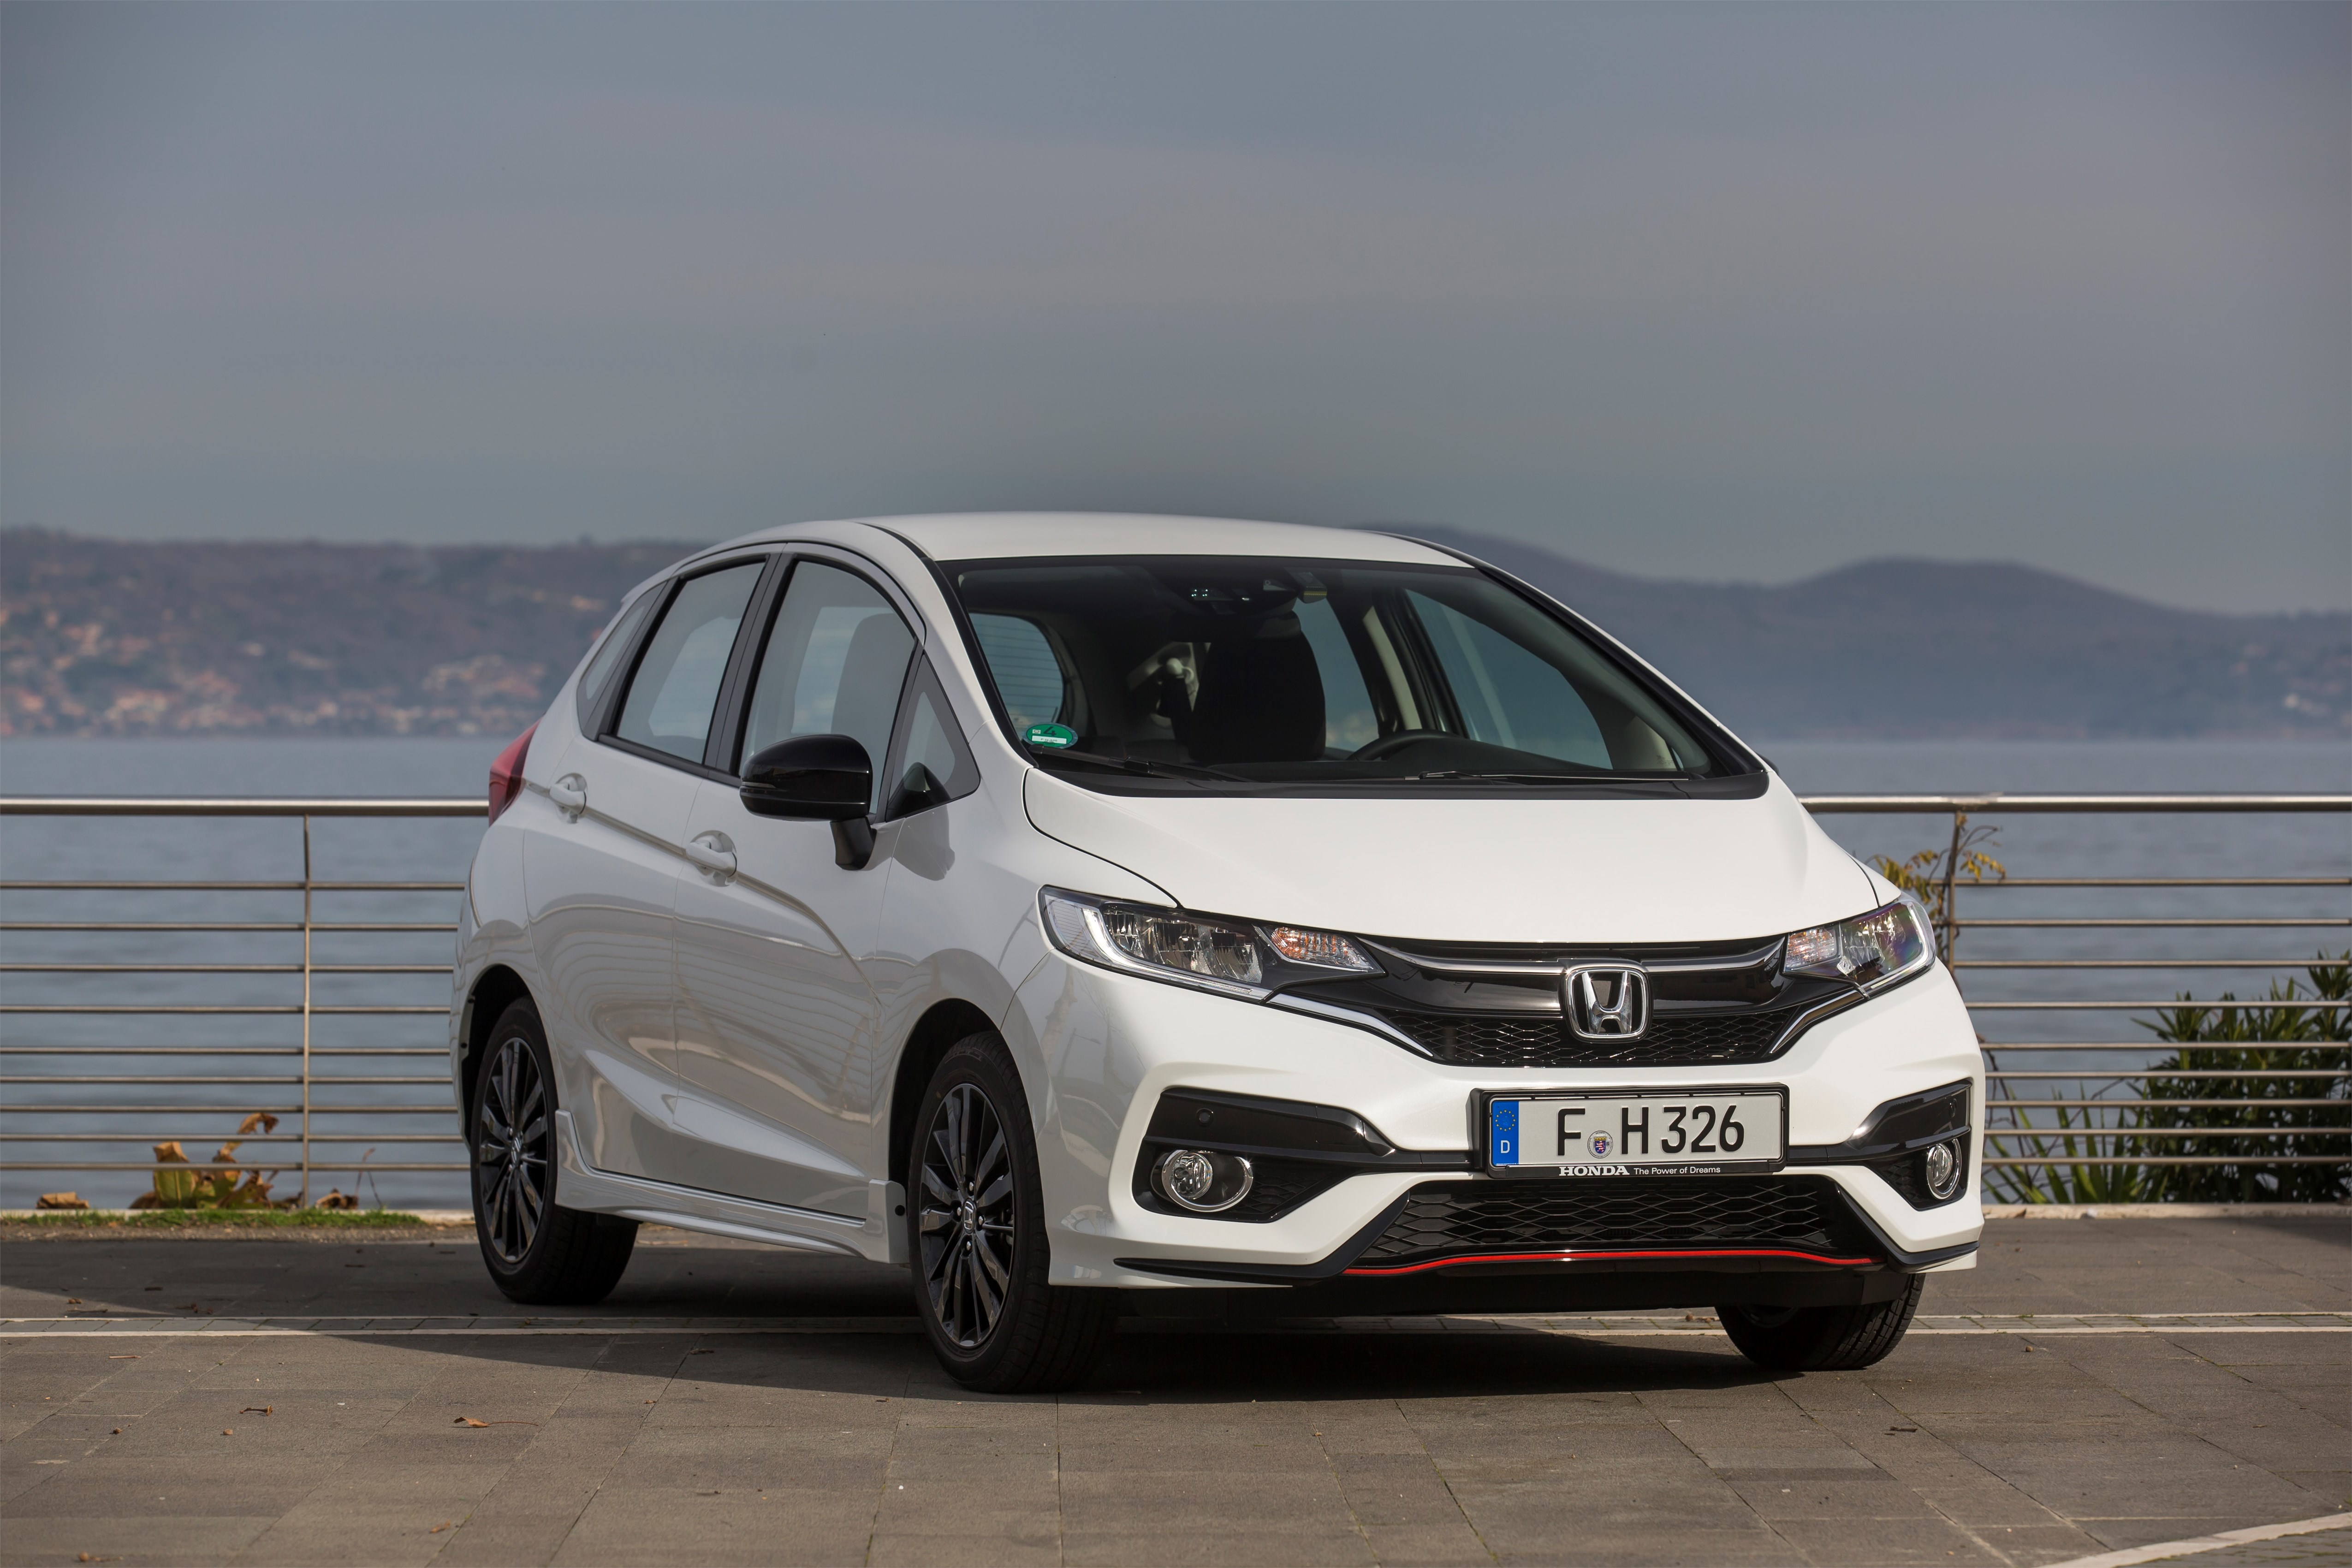 2018 Jazz Dynamic 1.5-litre i-VTEC